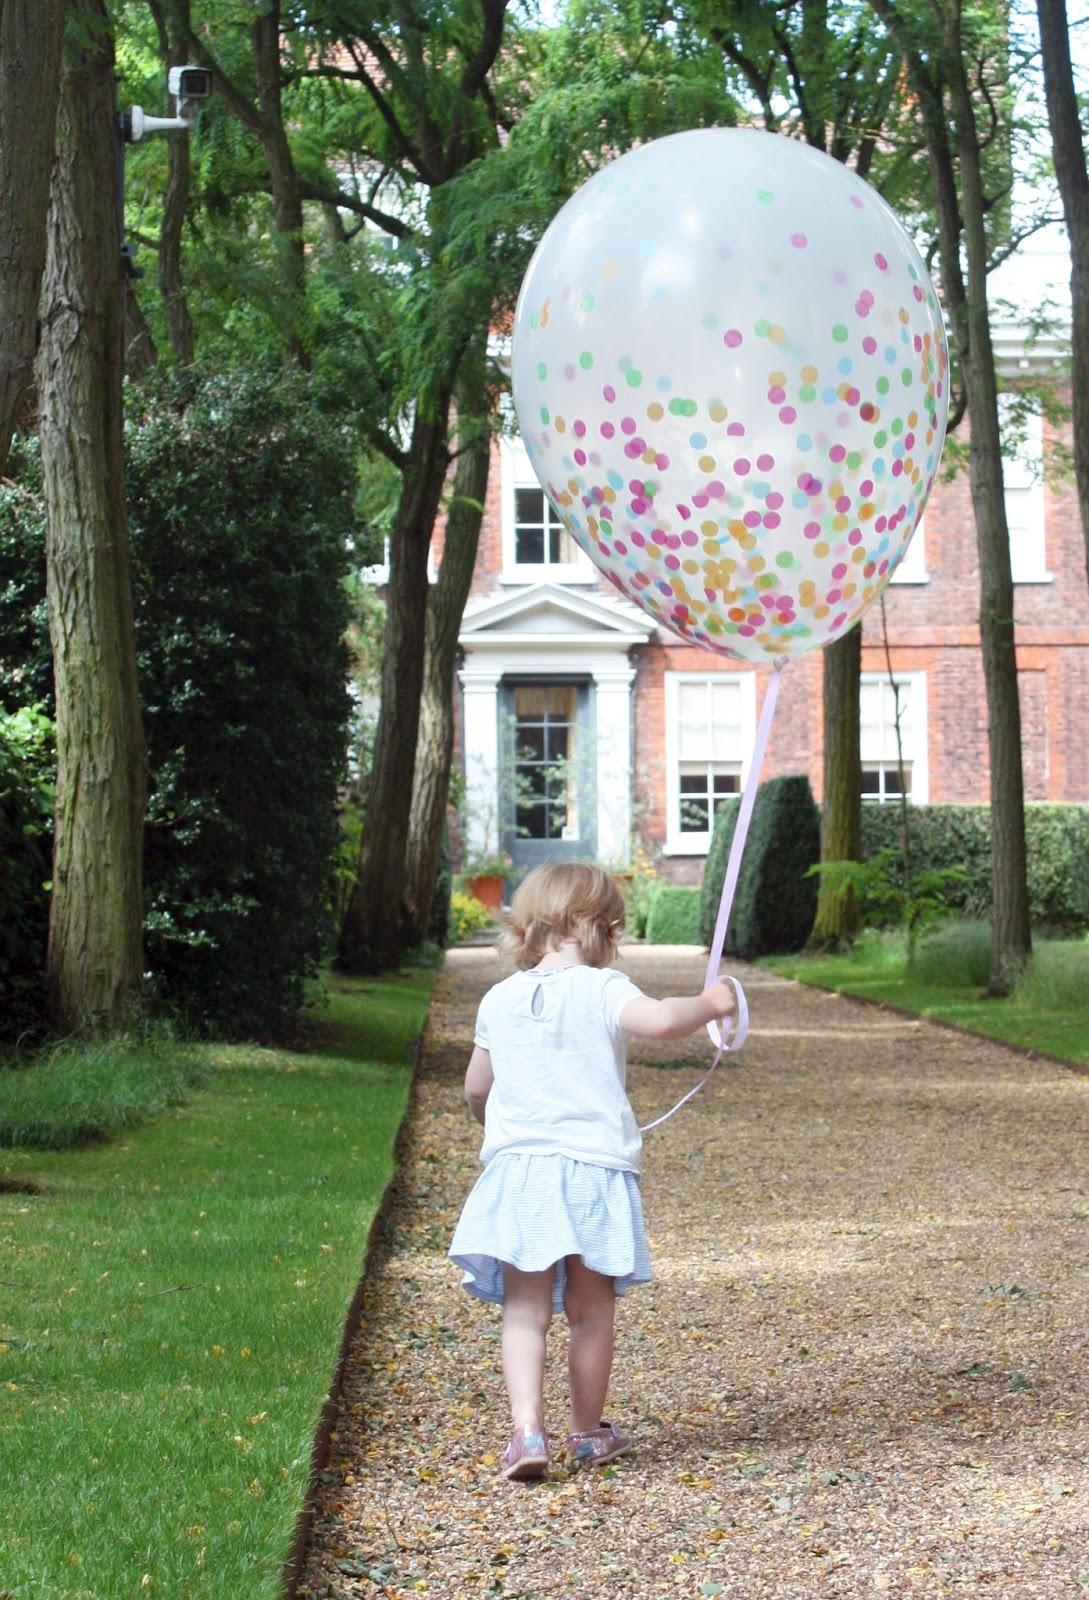 meg-made giant confetti balloon giant confetti filled balloon